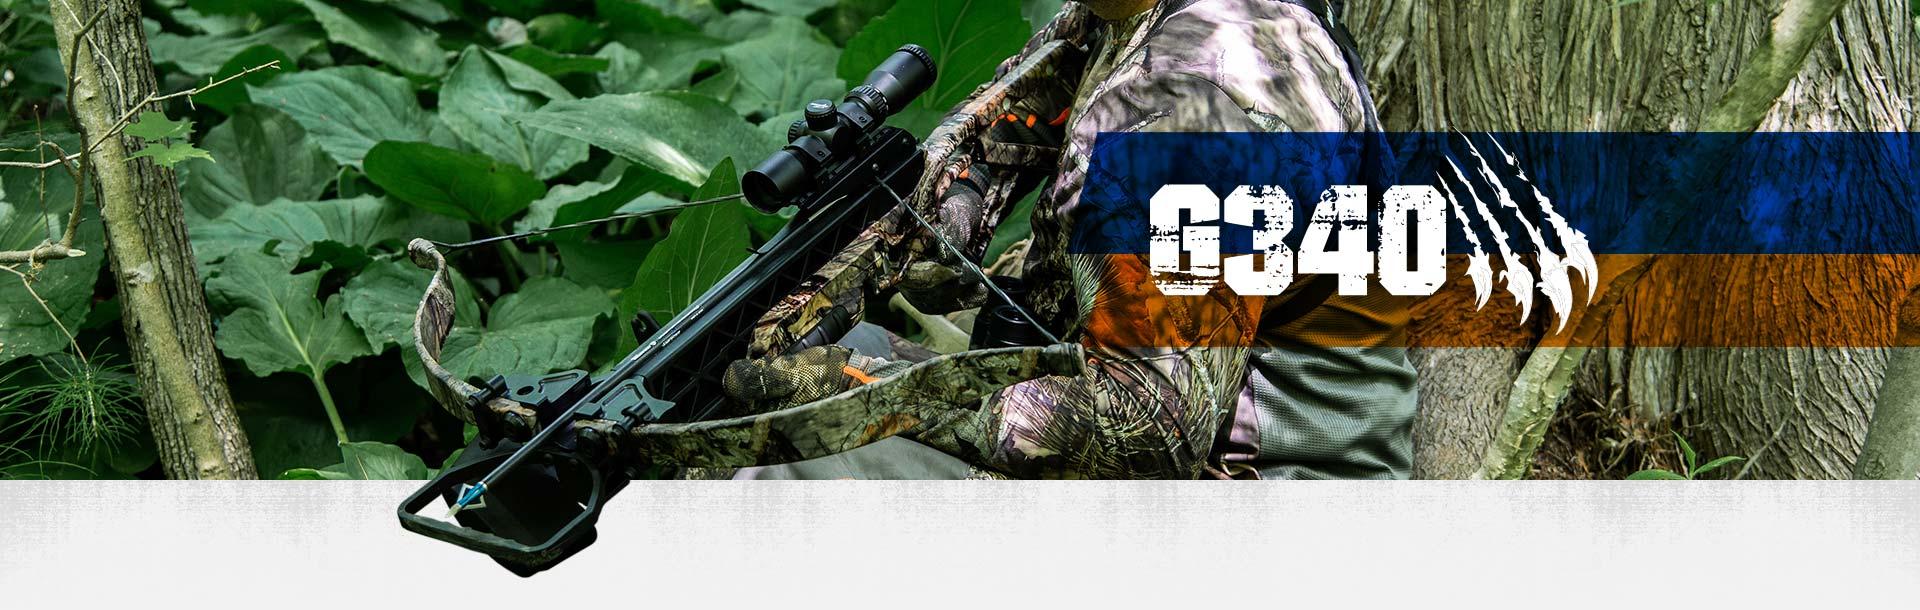 Excalibur G340 crossbow in camo